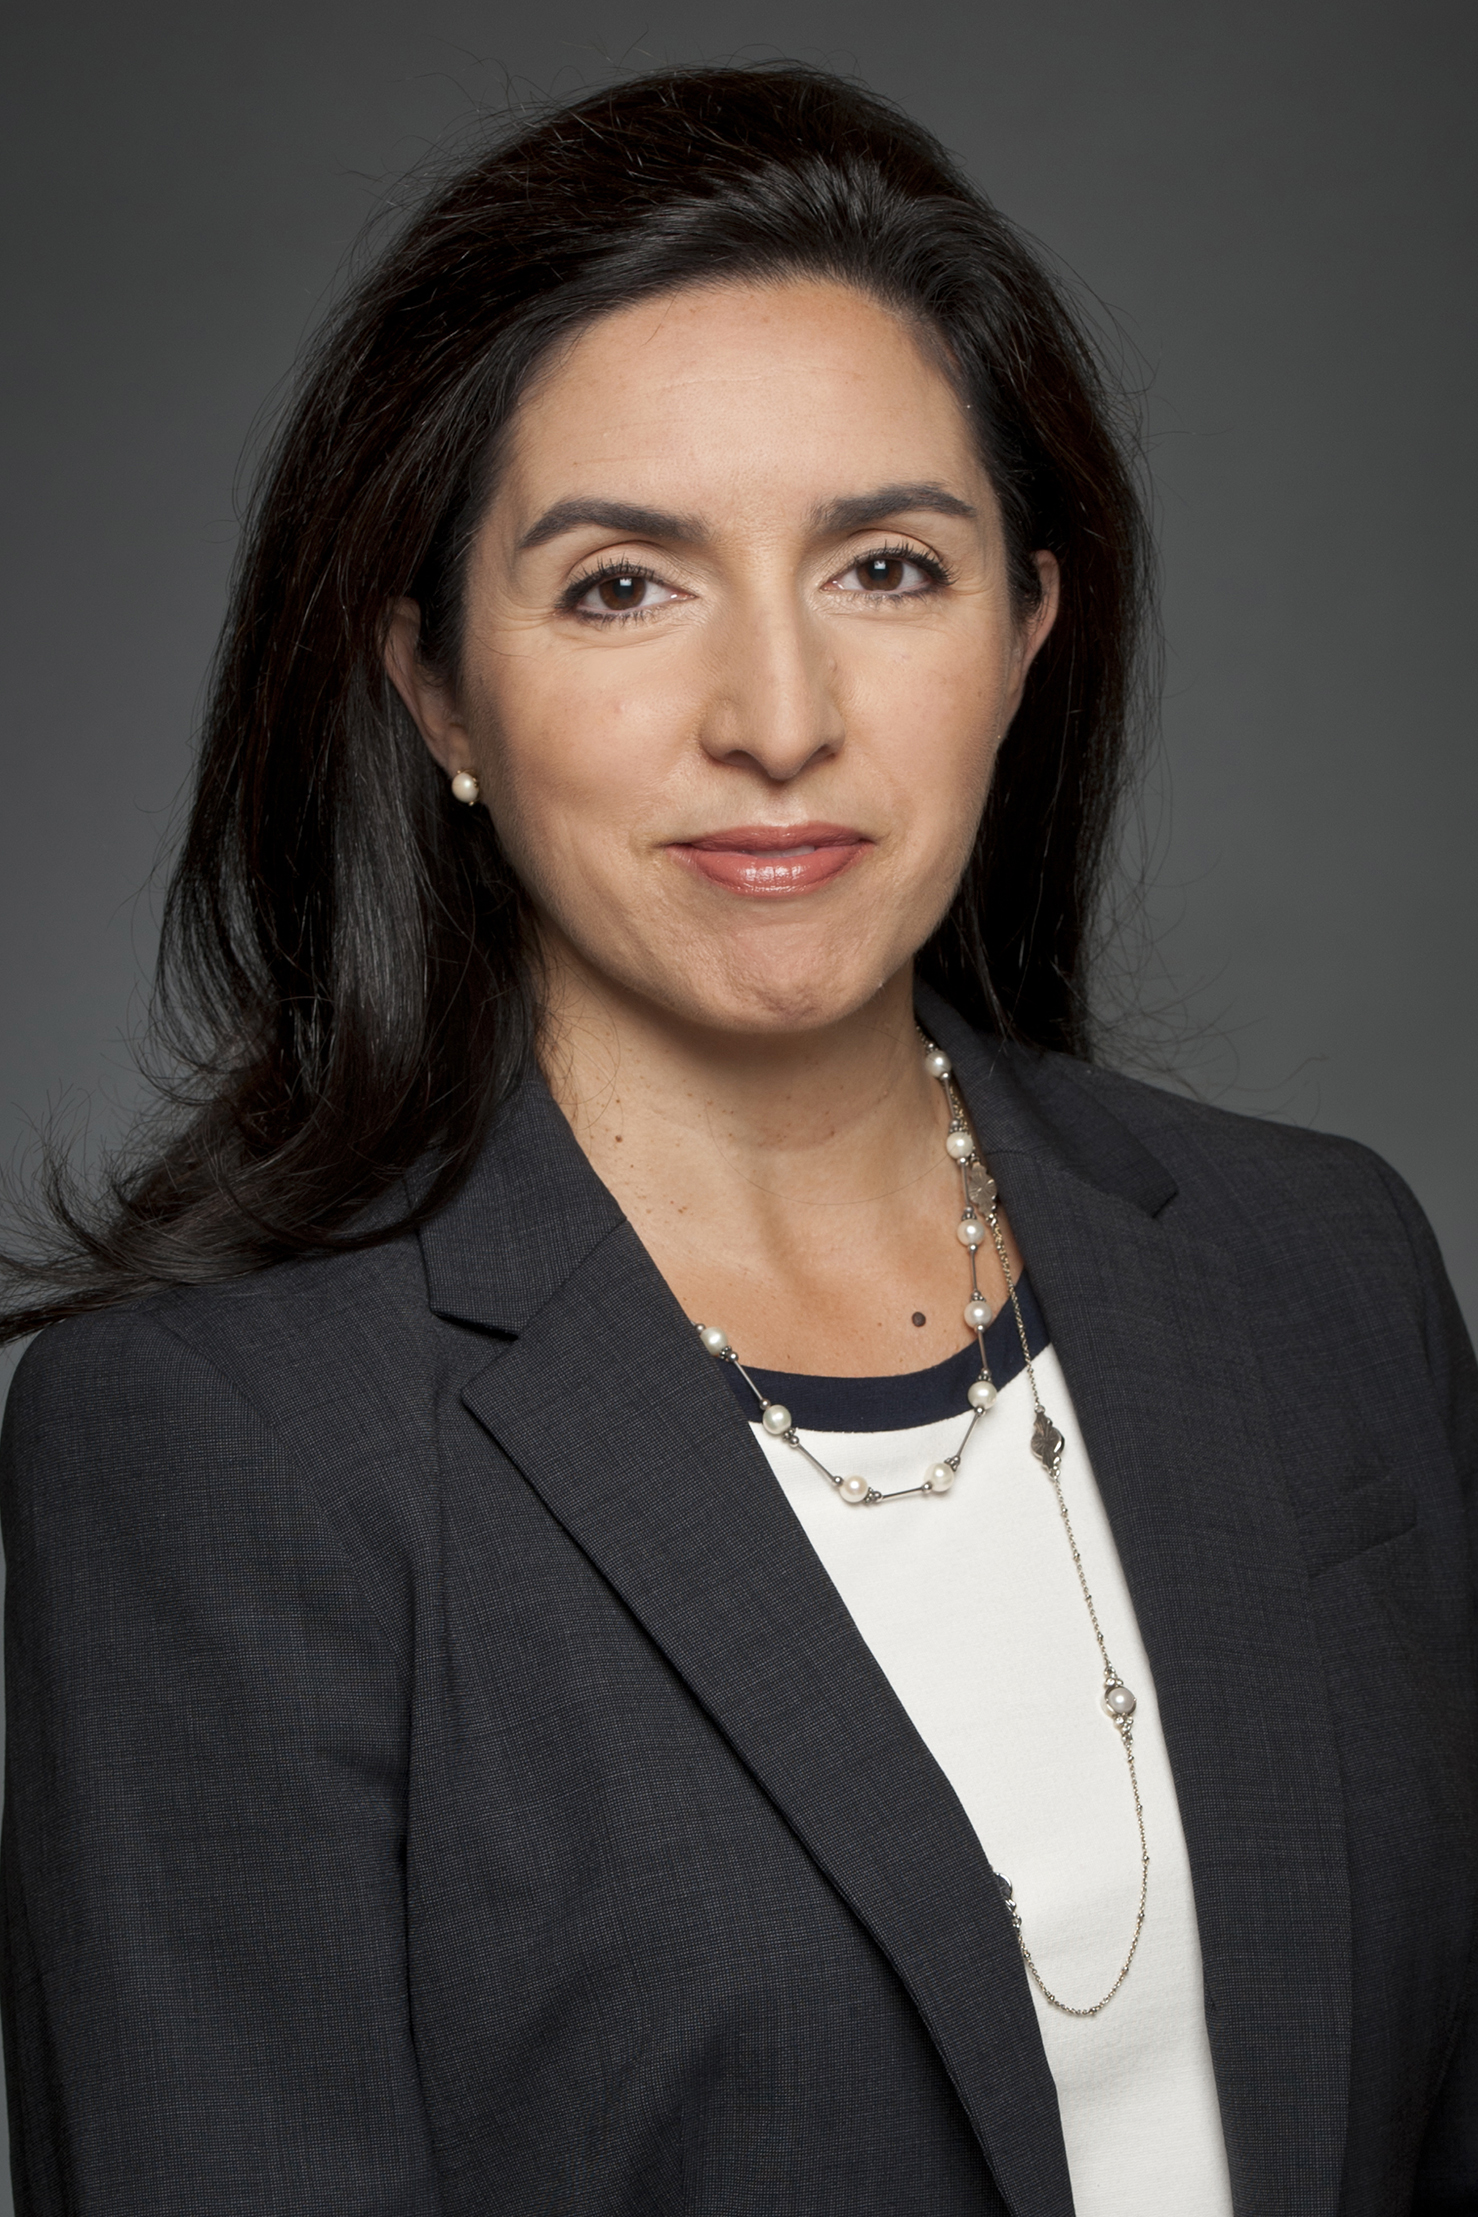 Viviana Fernandez